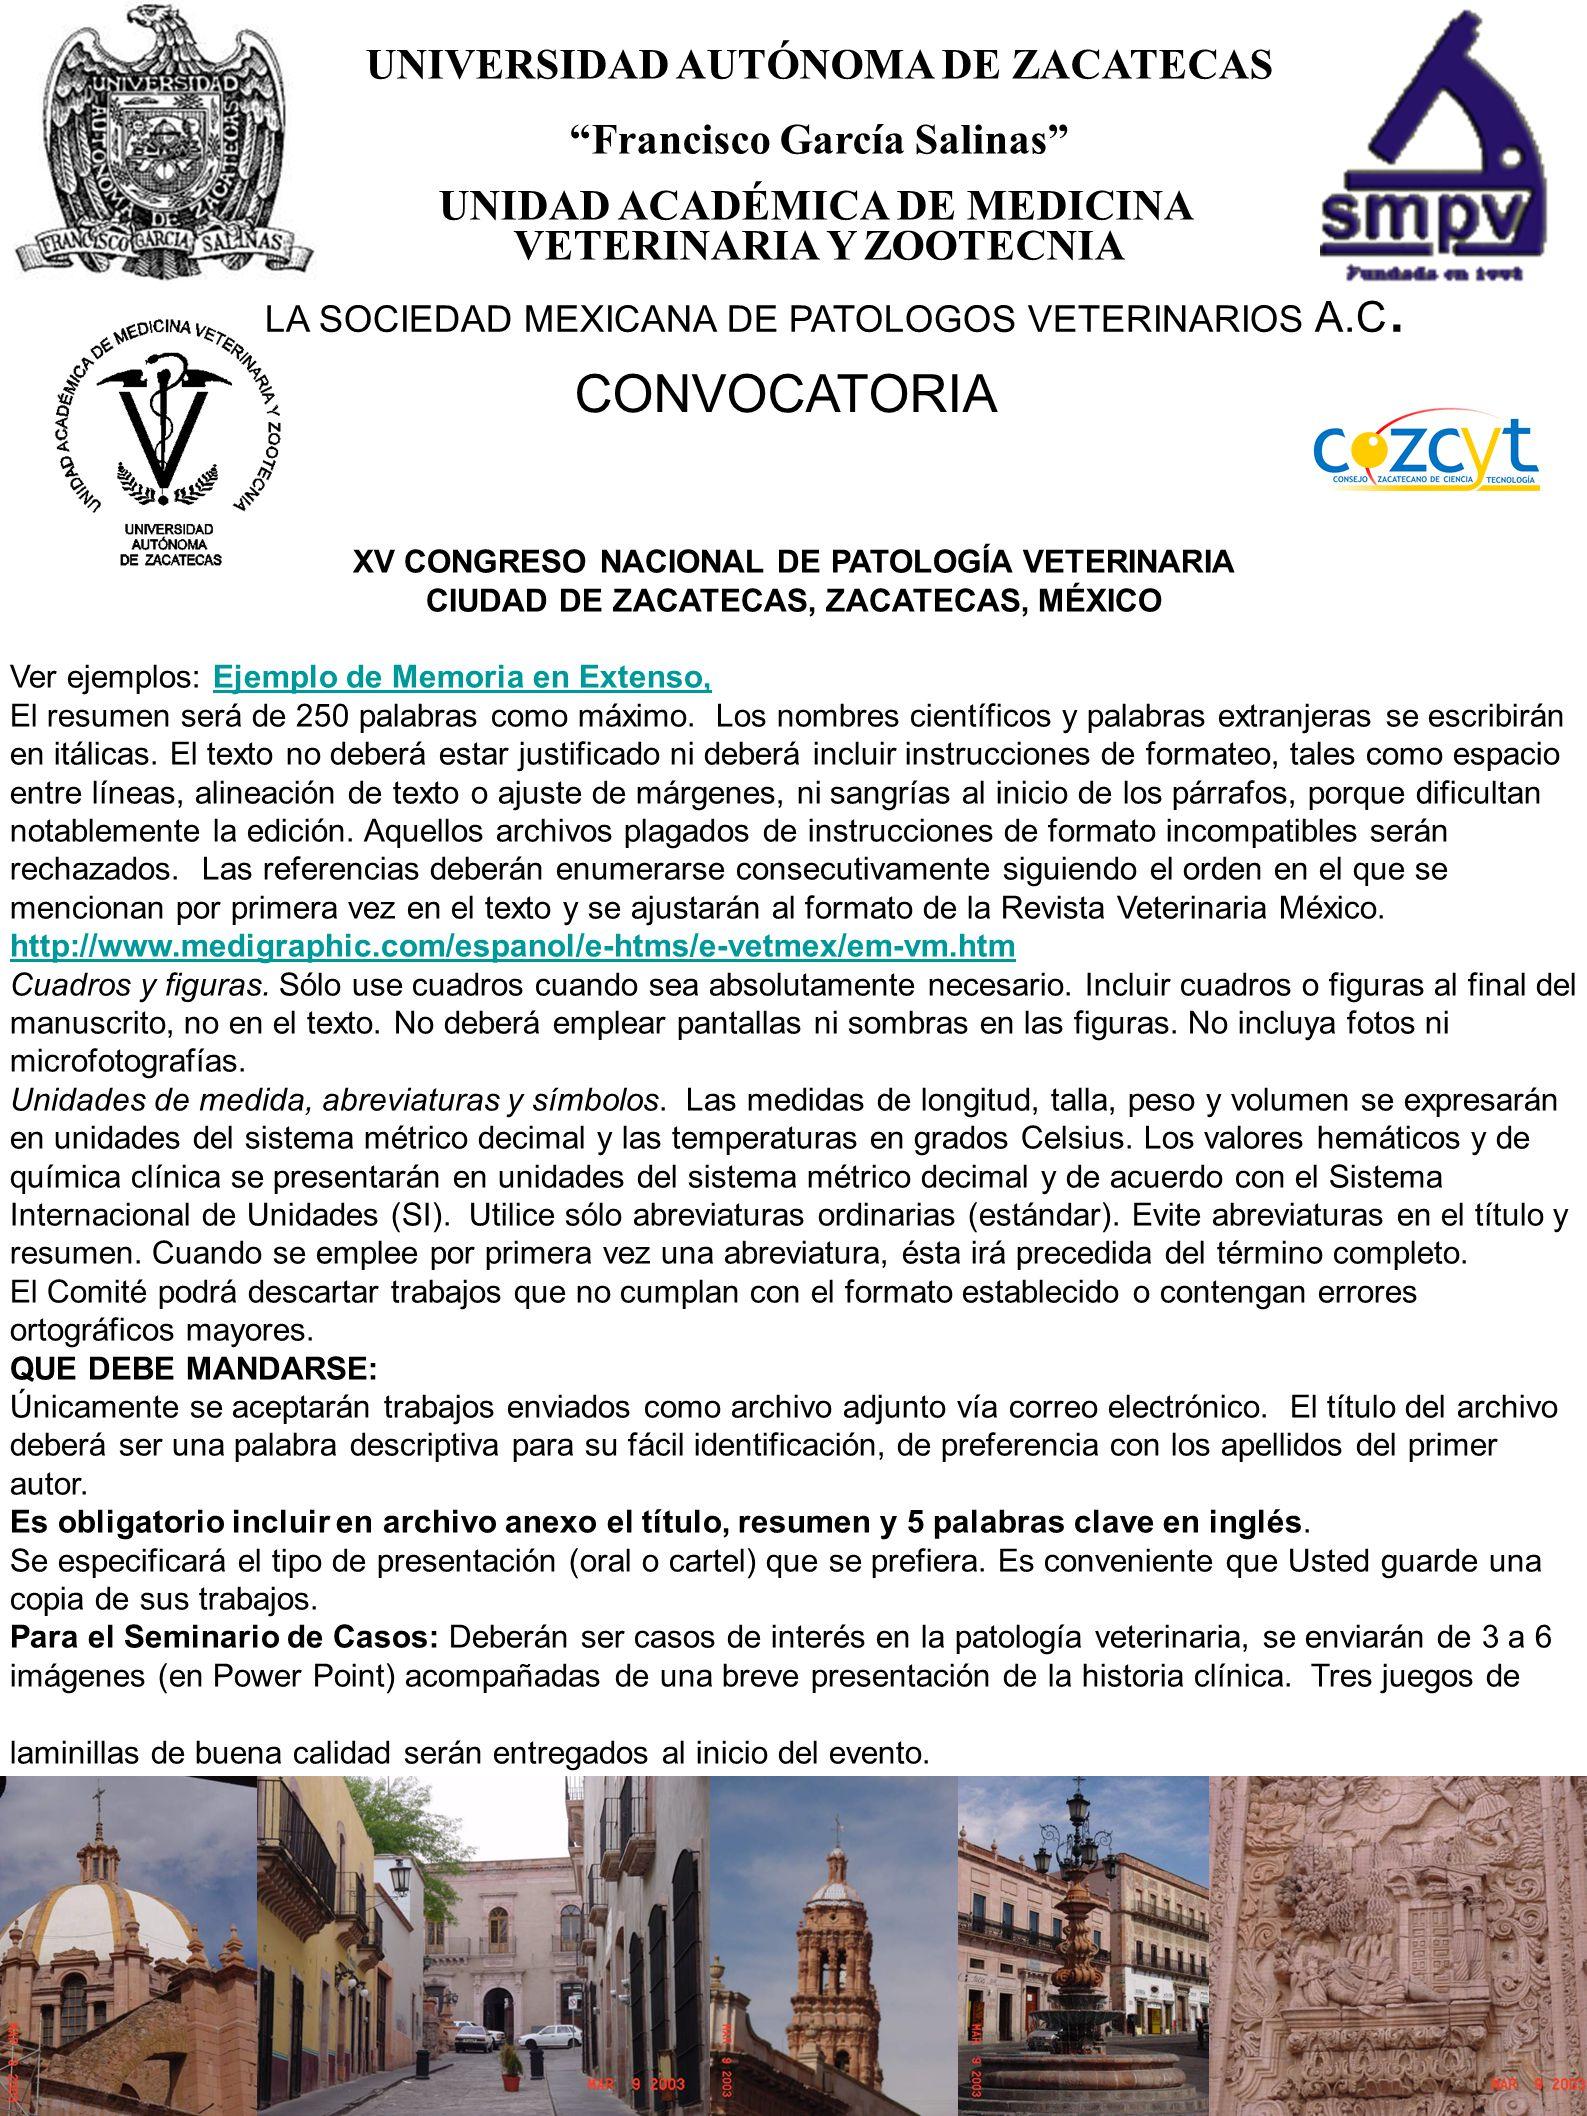 CONVOCATORIA XV CONGRESO NACIONAL DE PATOLOGIA VETERINARIA